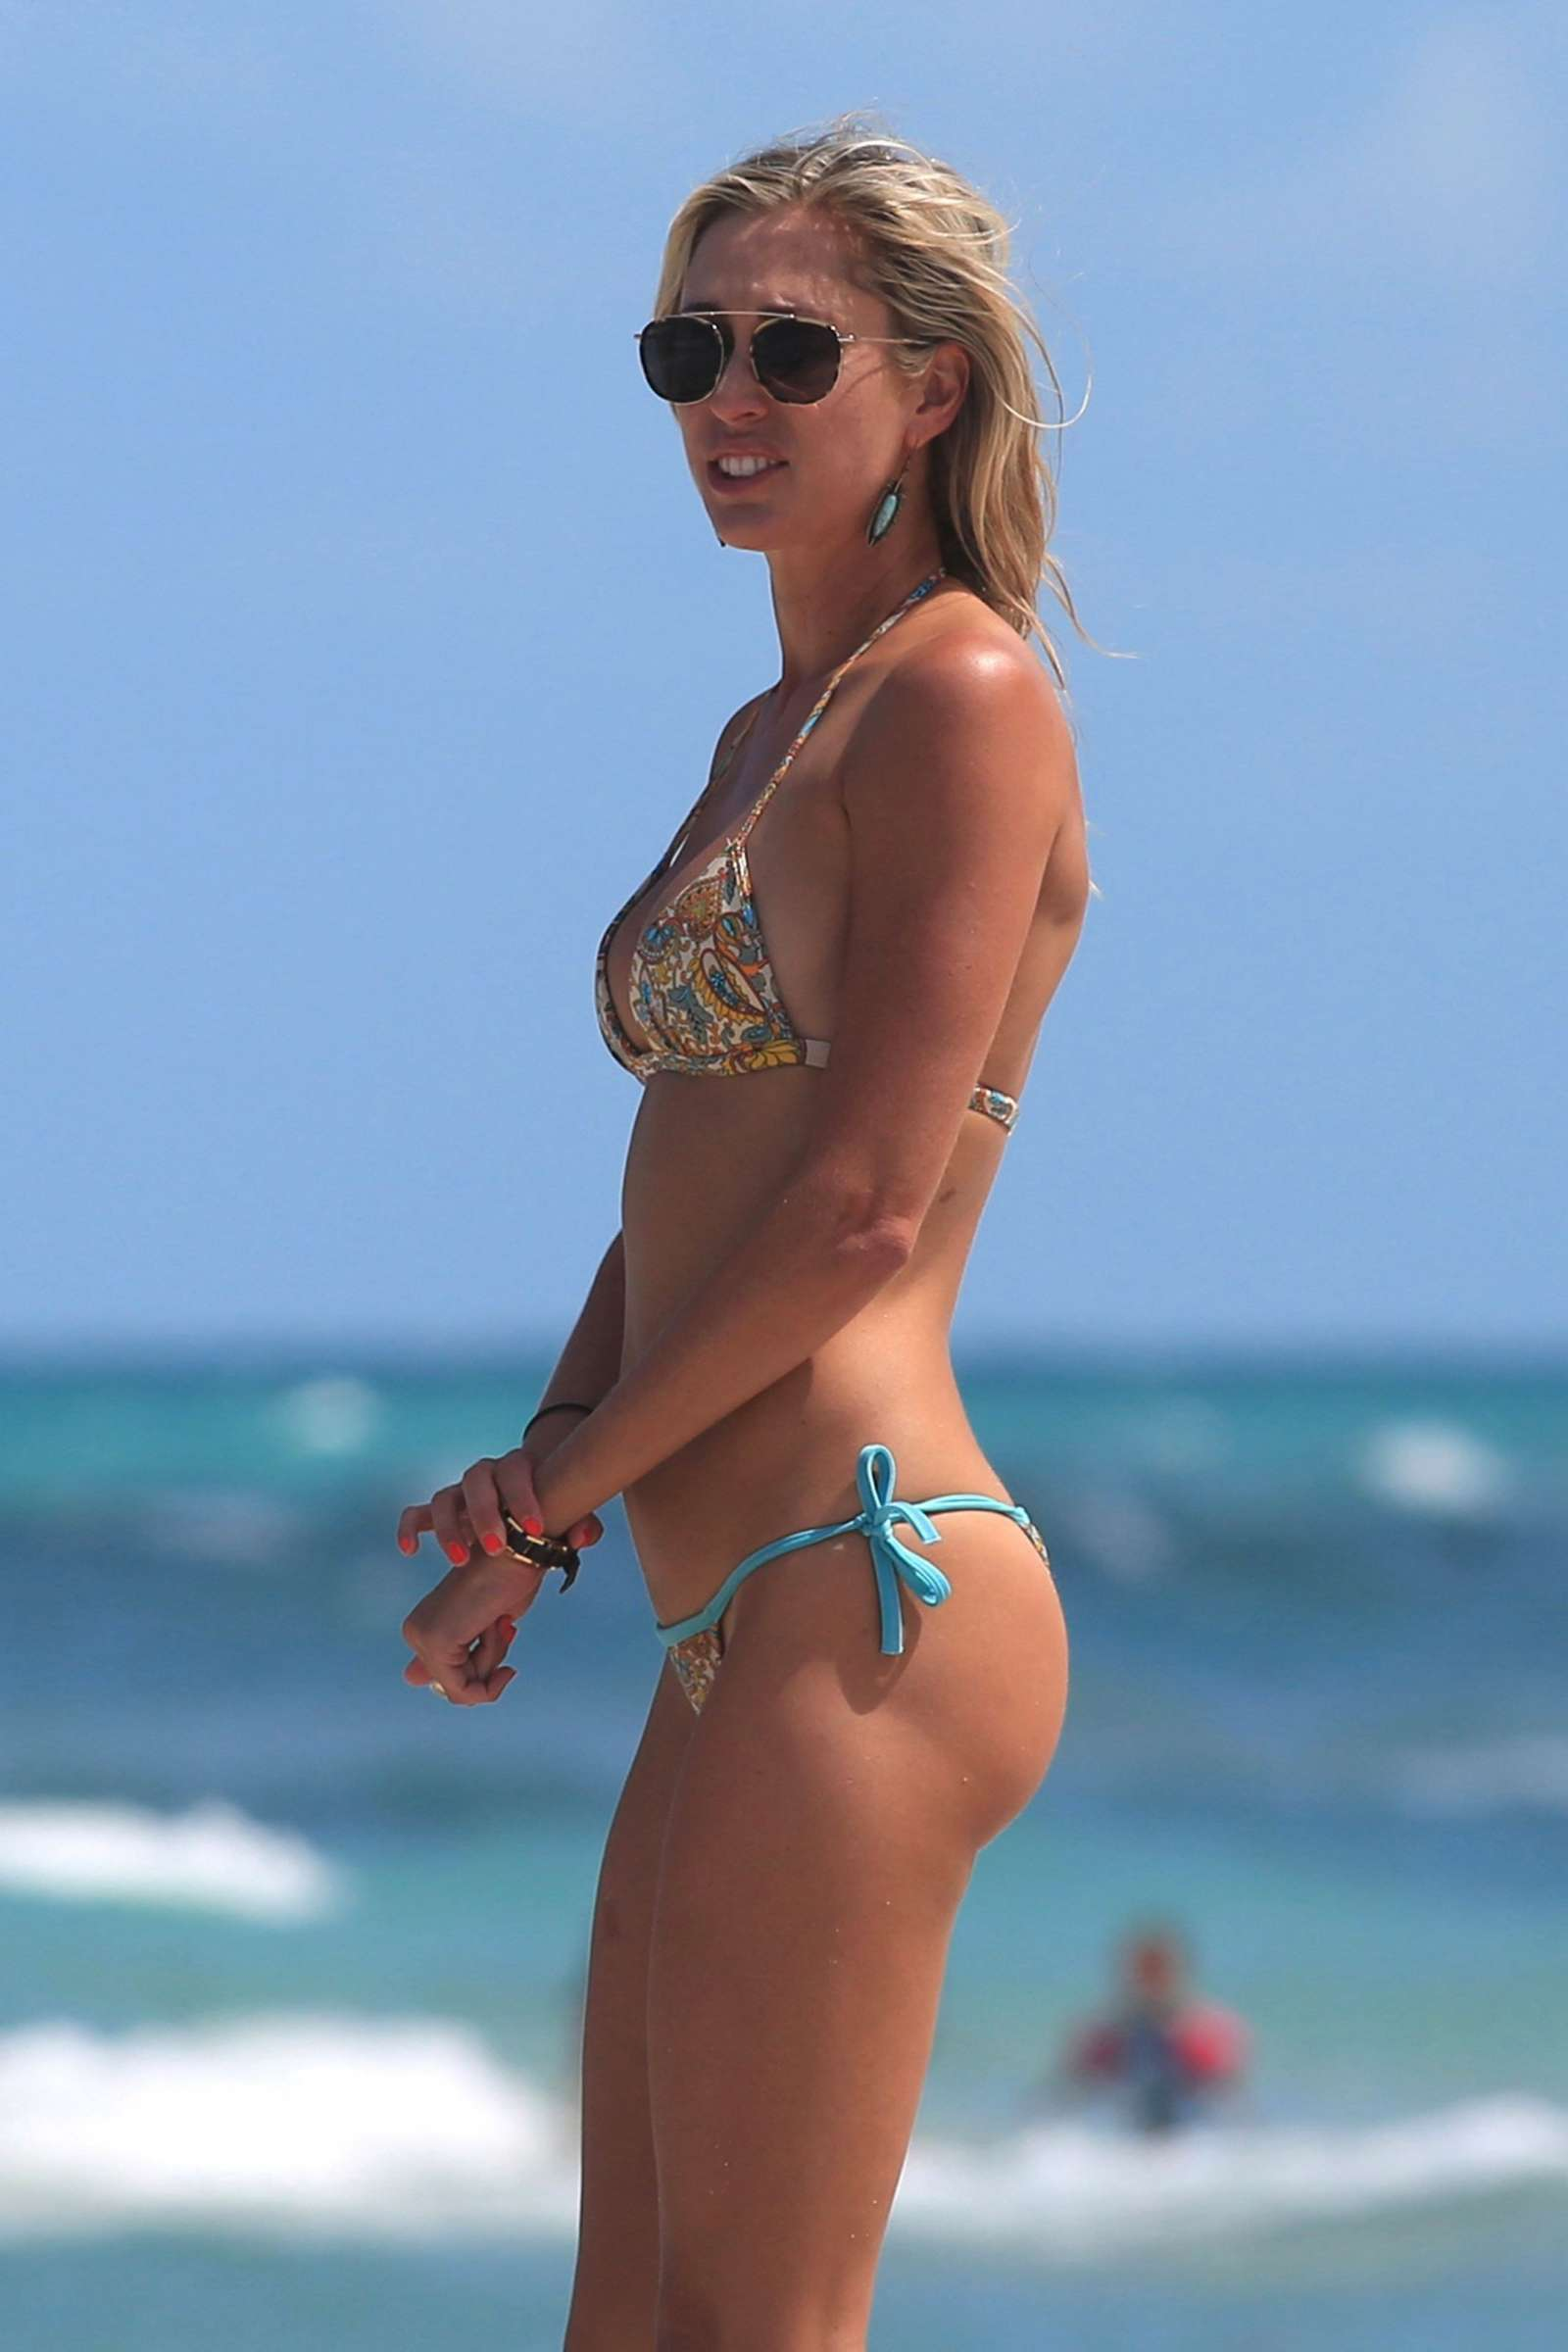 Lauren Stoner in Bikini at the beach in Miami